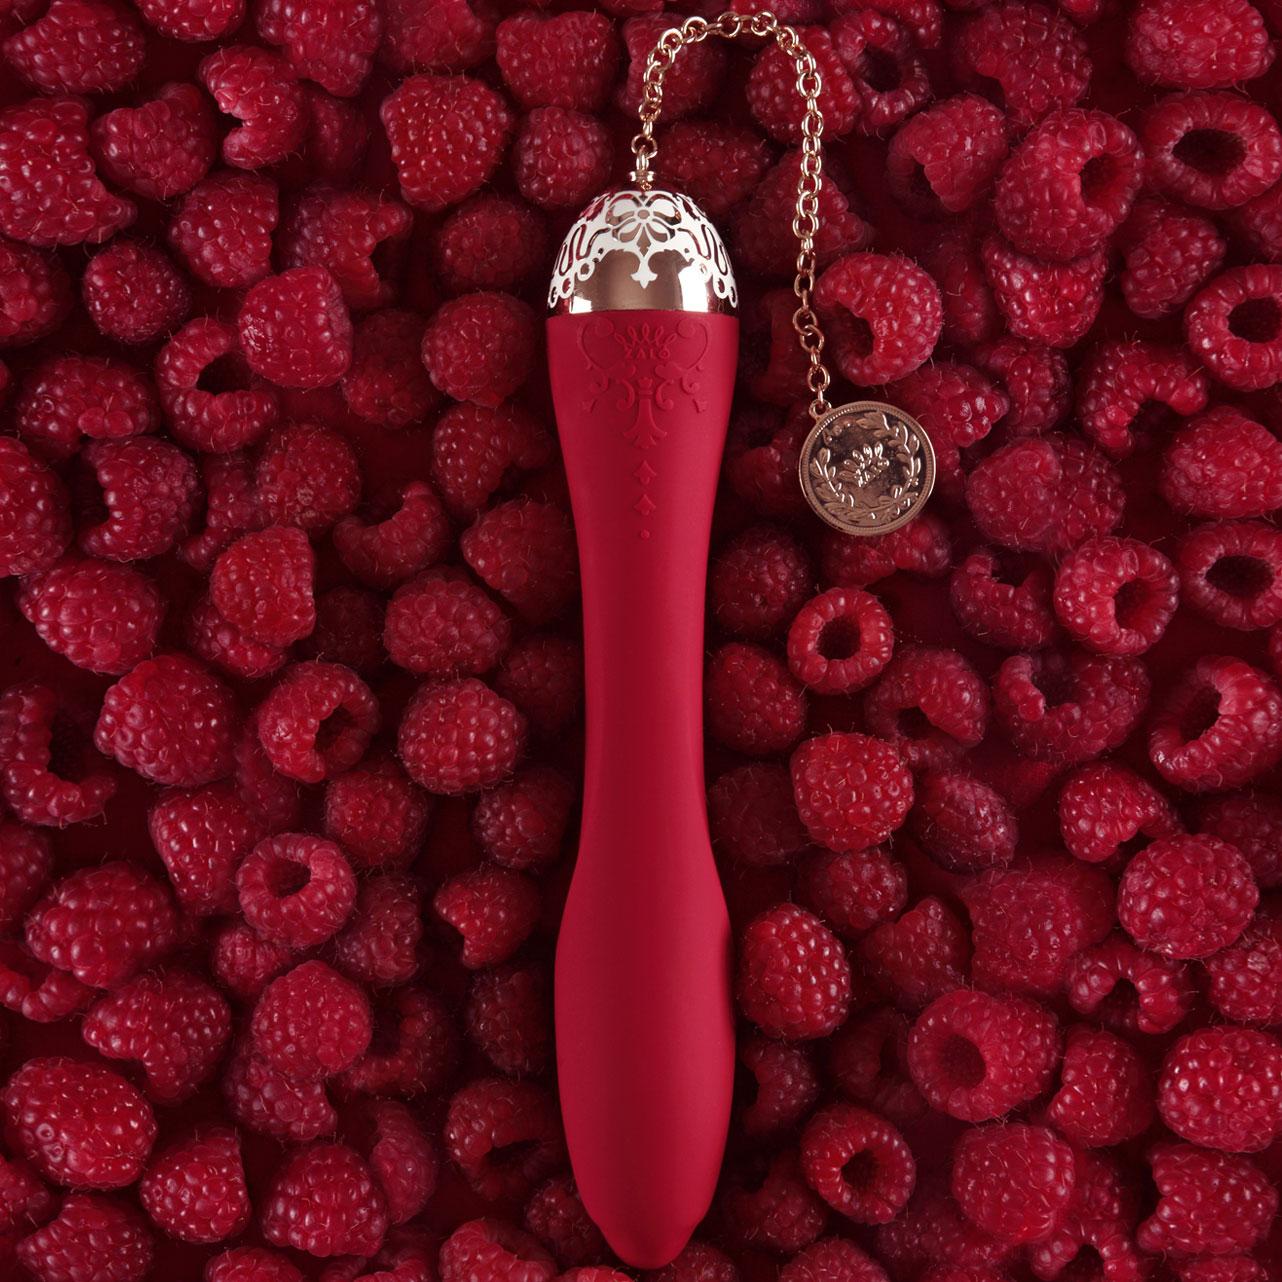 ZALO Marie Waterproof Silicone G-Spot Vibrator - Glamour